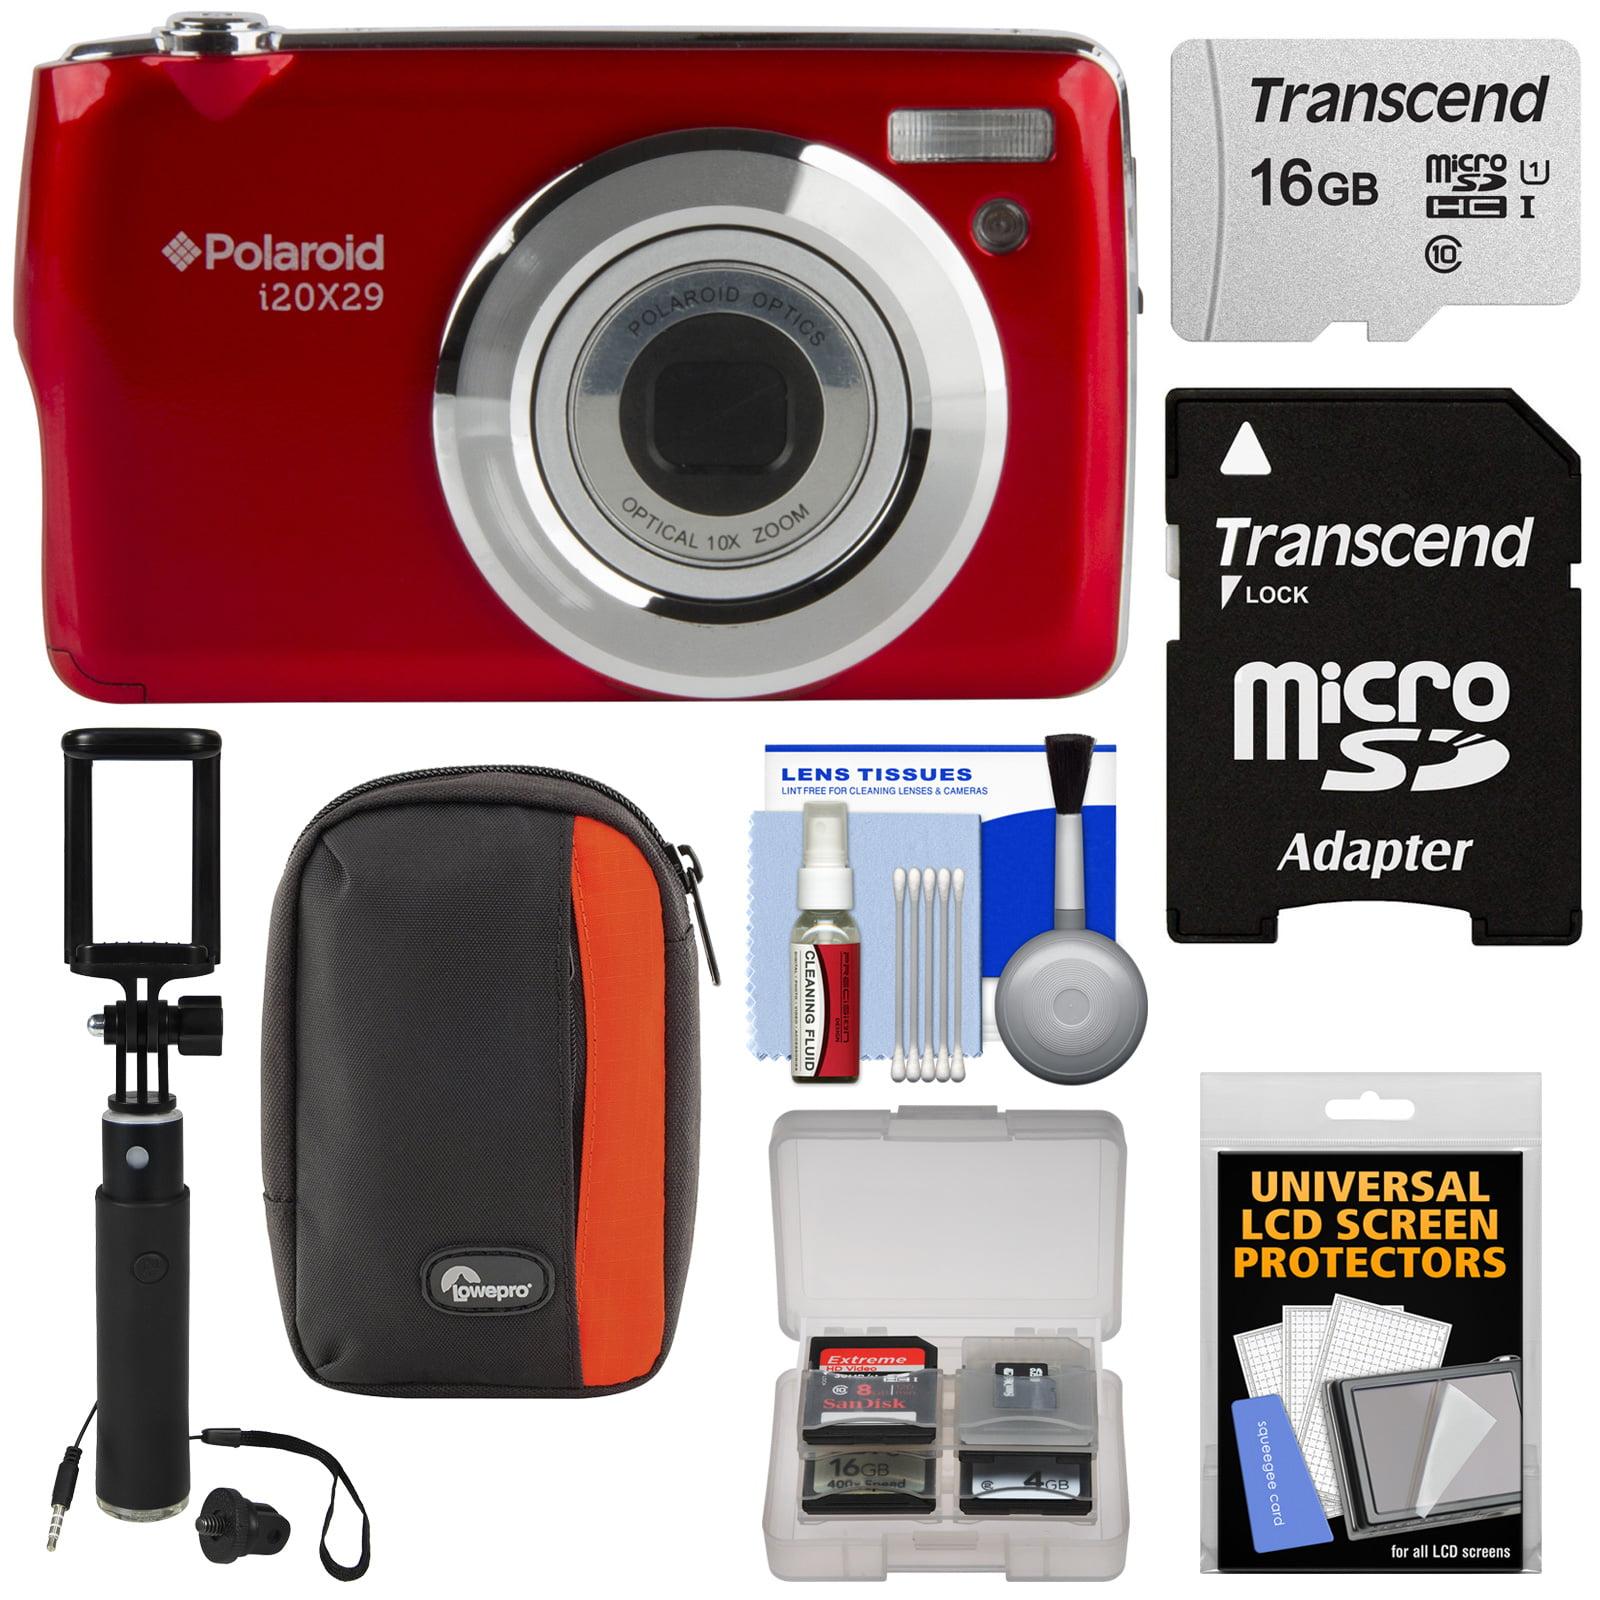 Polaroid i20X29 Digital Camera (Red) with 16GB Card + Case + Selfi Stick + Kit